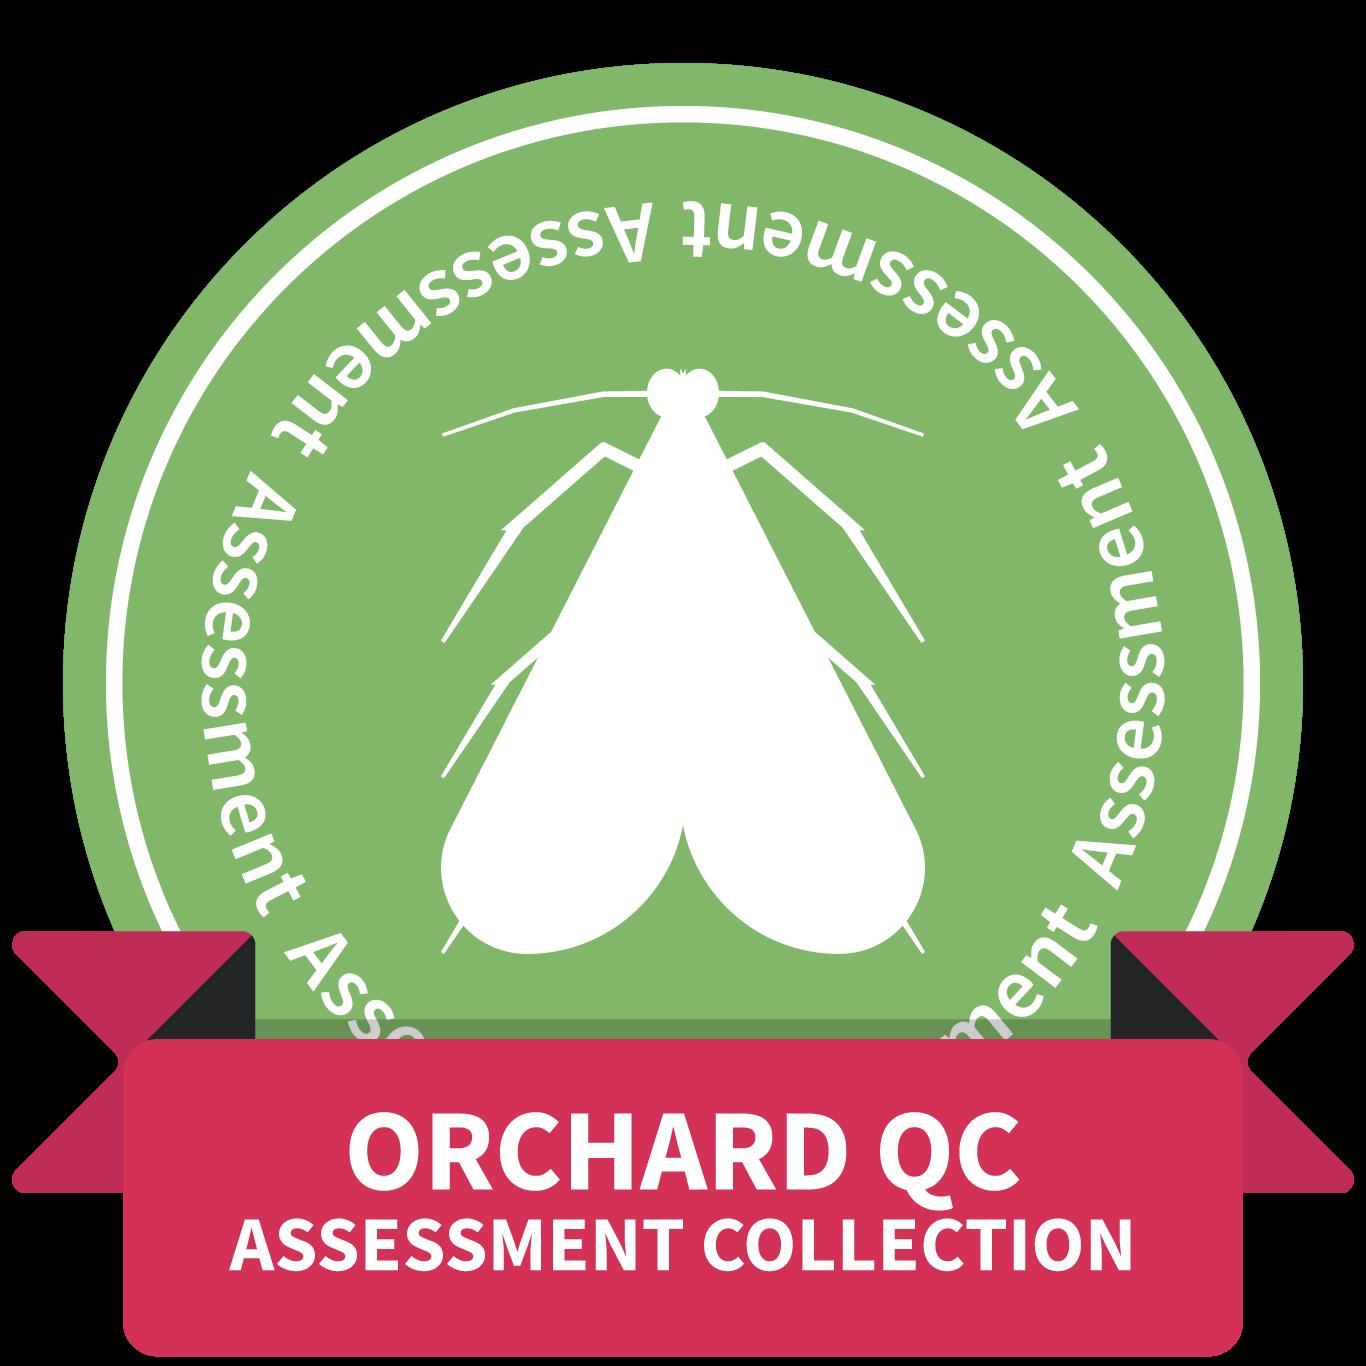 Orchard QC: Codling moth badges